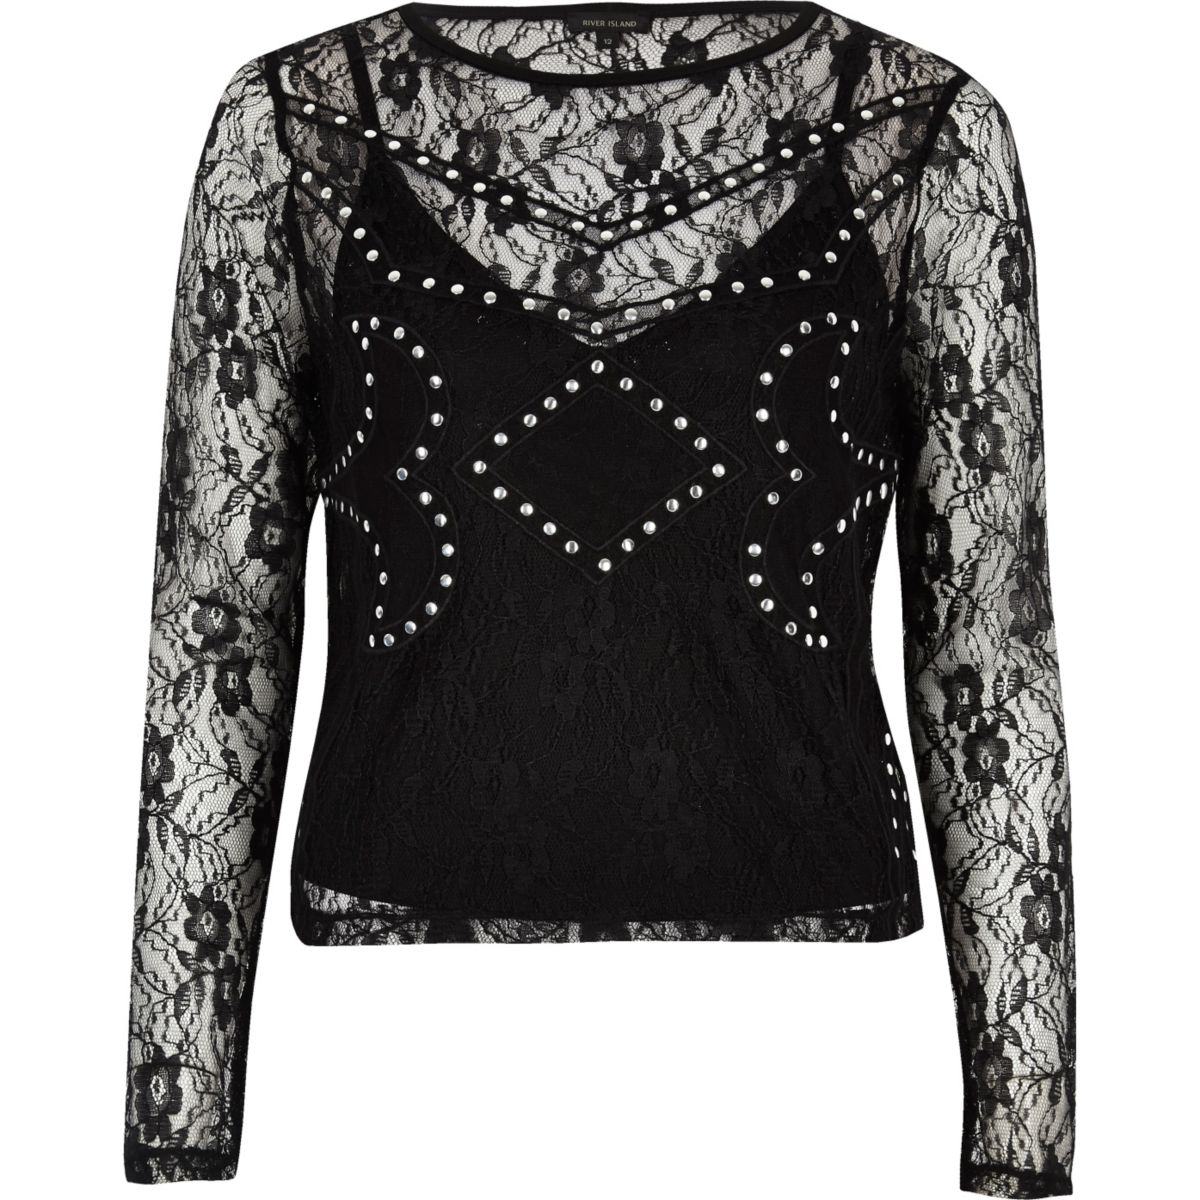 Black embroidered stud top